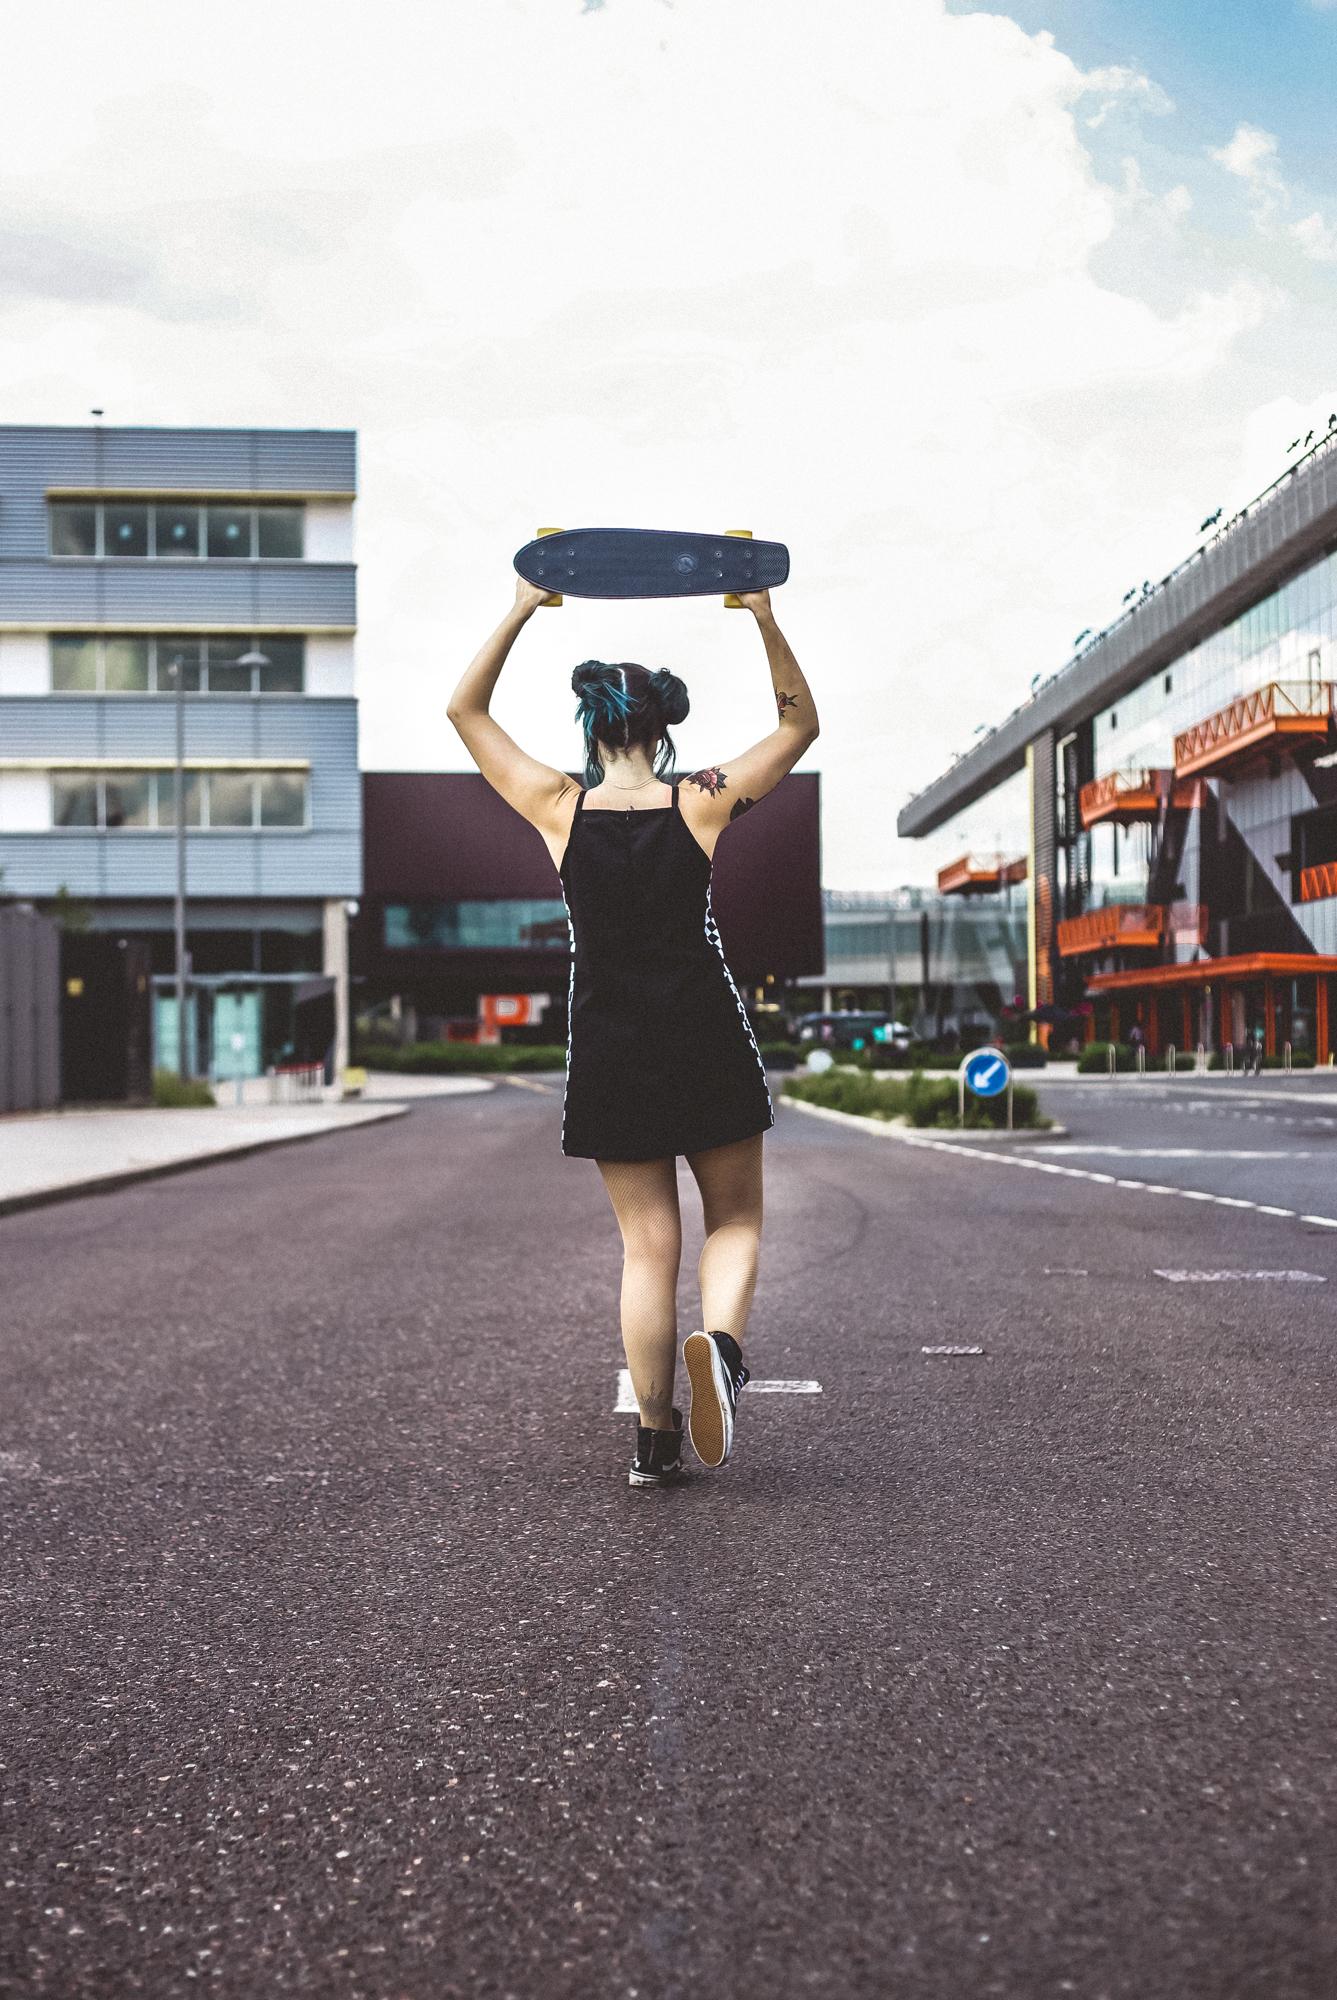 Emma Inks alternative style with skateboard in stratford